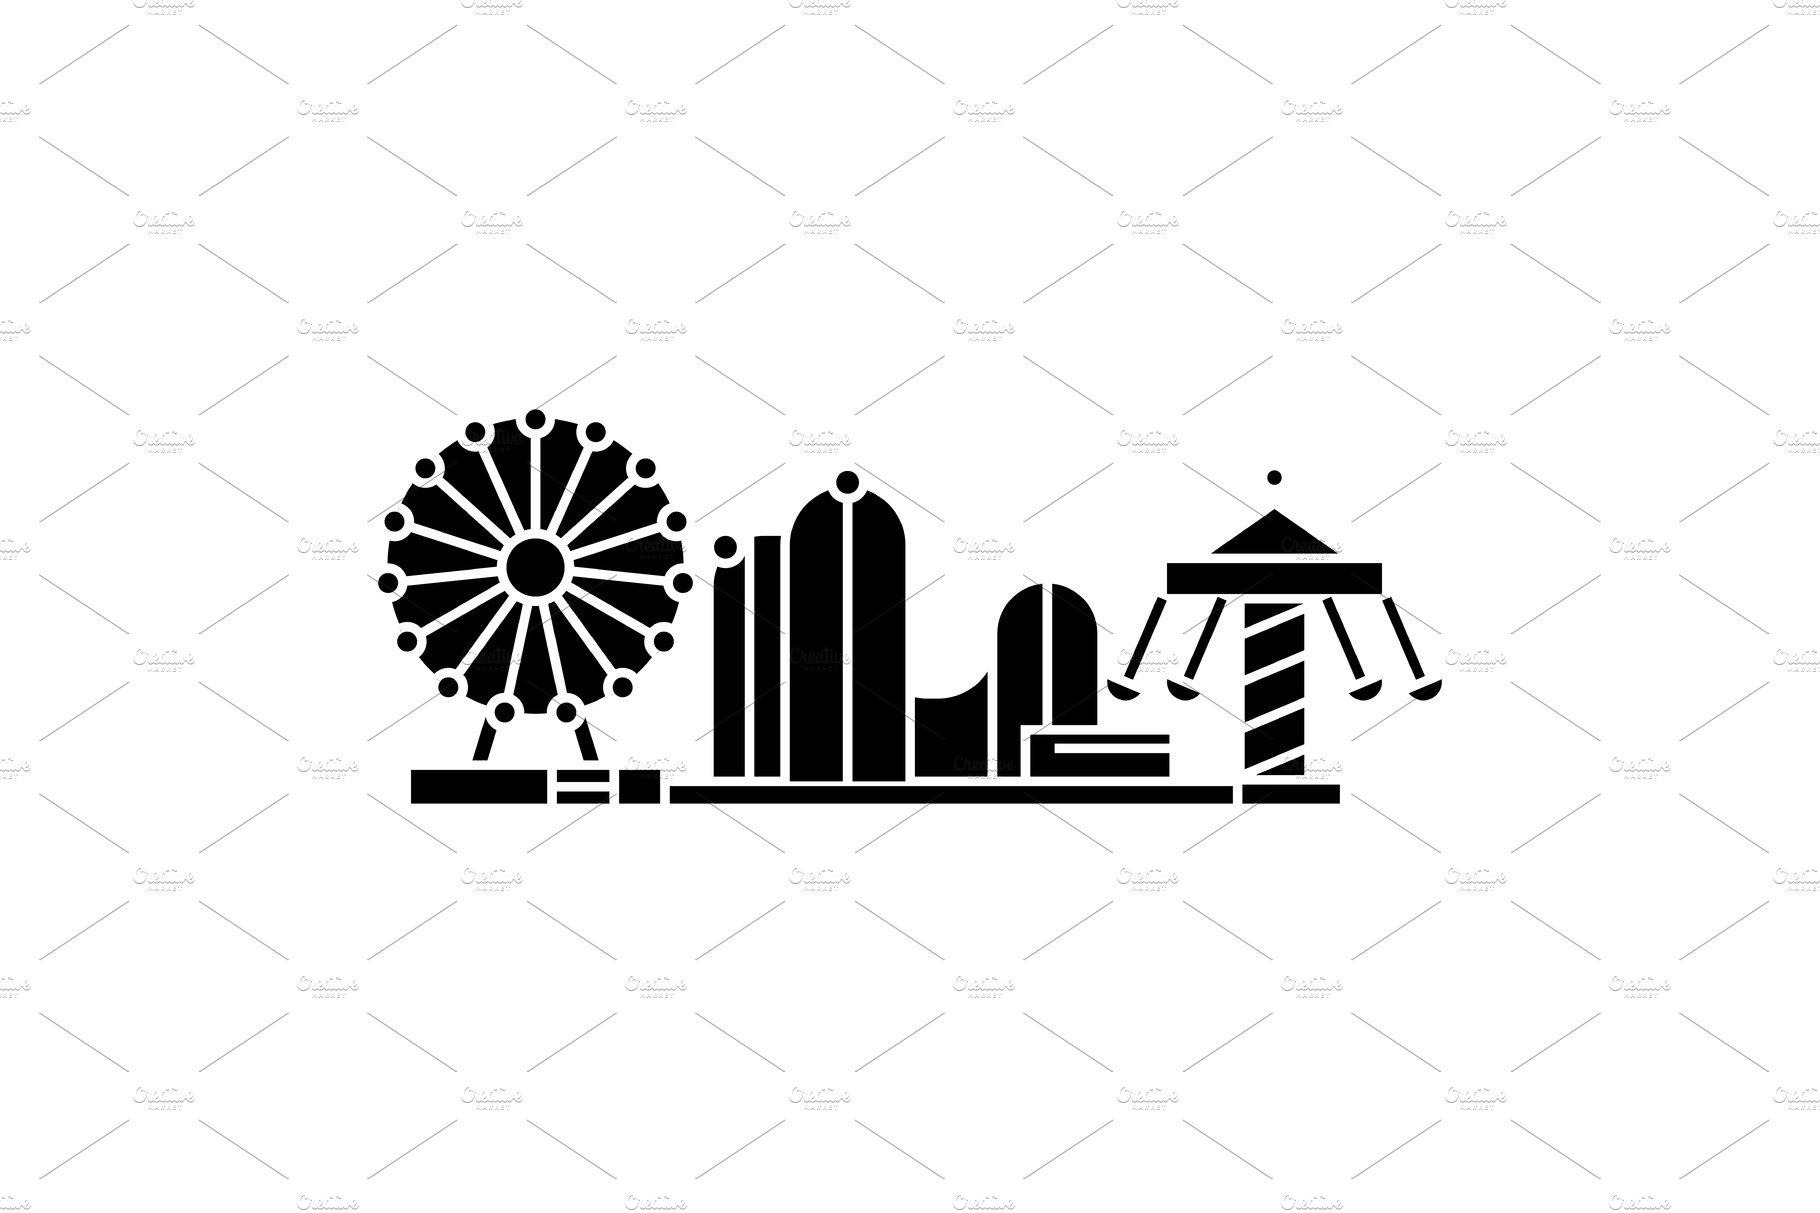 Amusement park signs clipart jpg royalty free Amusement park black icon concept. Amusement park vector sign, symbol,  illustration. jpg royalty free